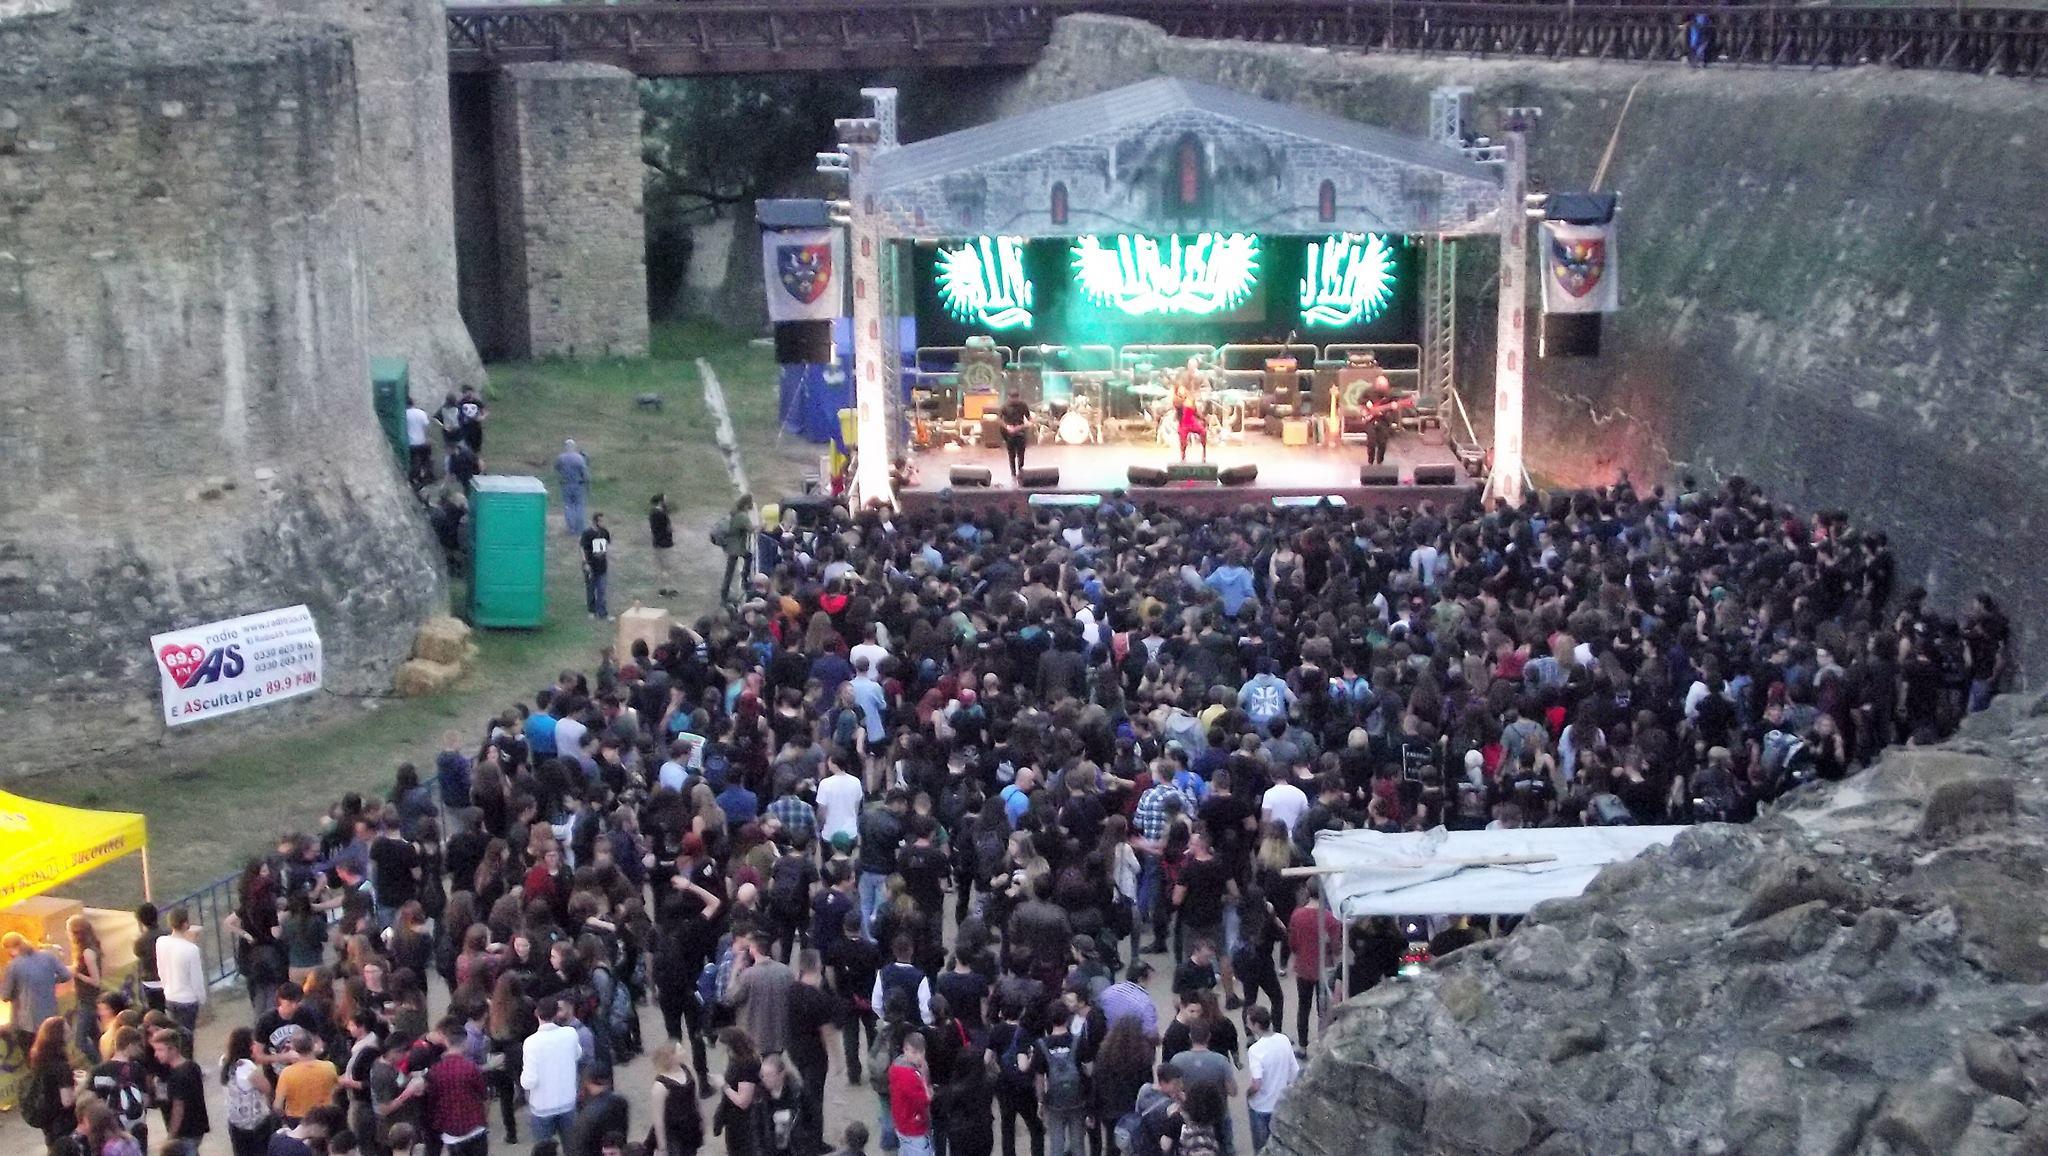 Coso rock 7